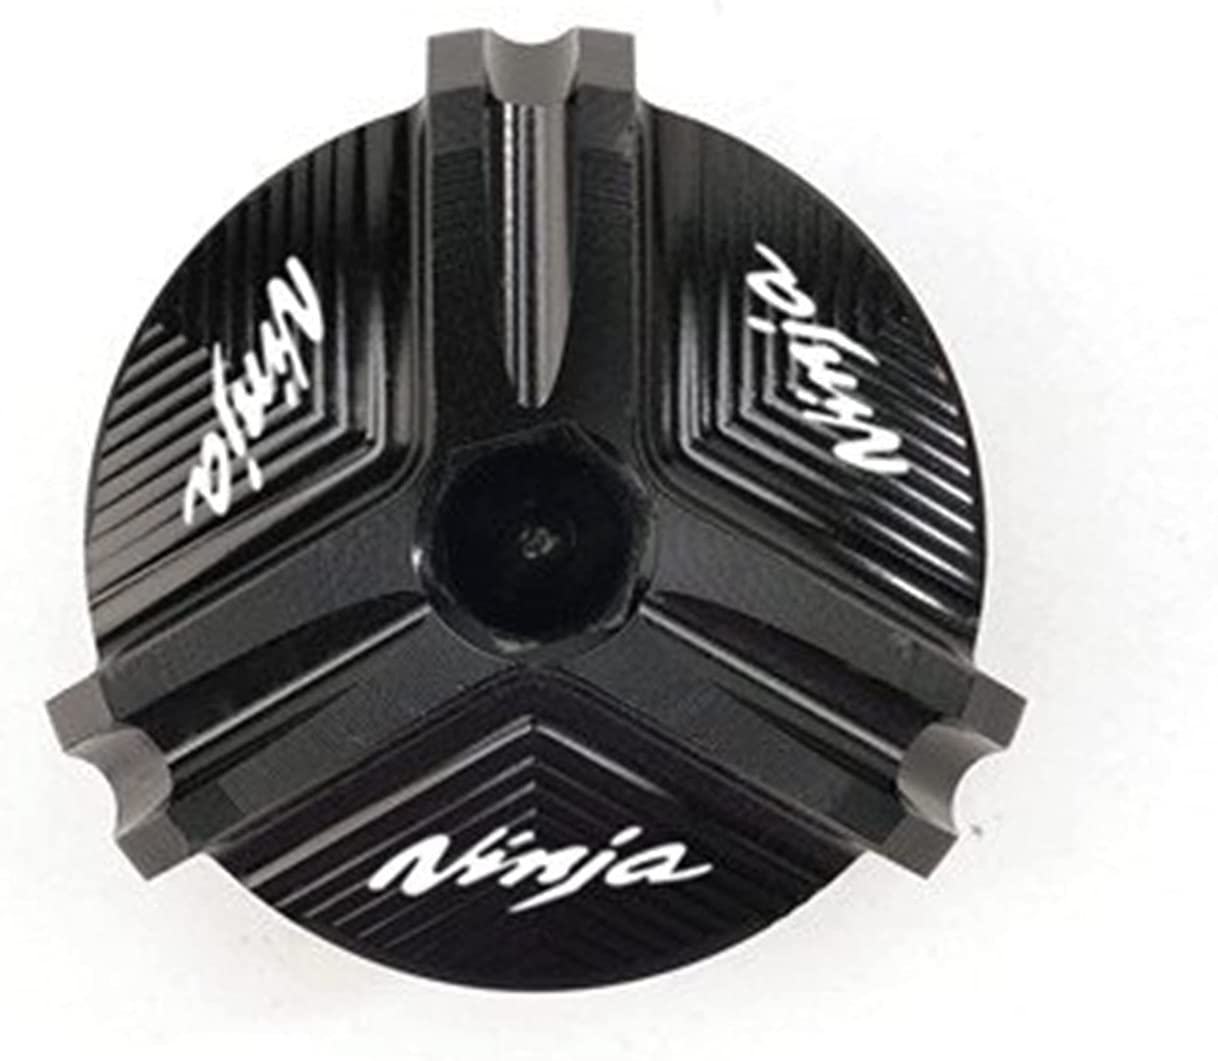 HDDTW Pro Taper Decorative Popularity Gas Caps High material 1000 Z250 Kawasaki Z for Z75